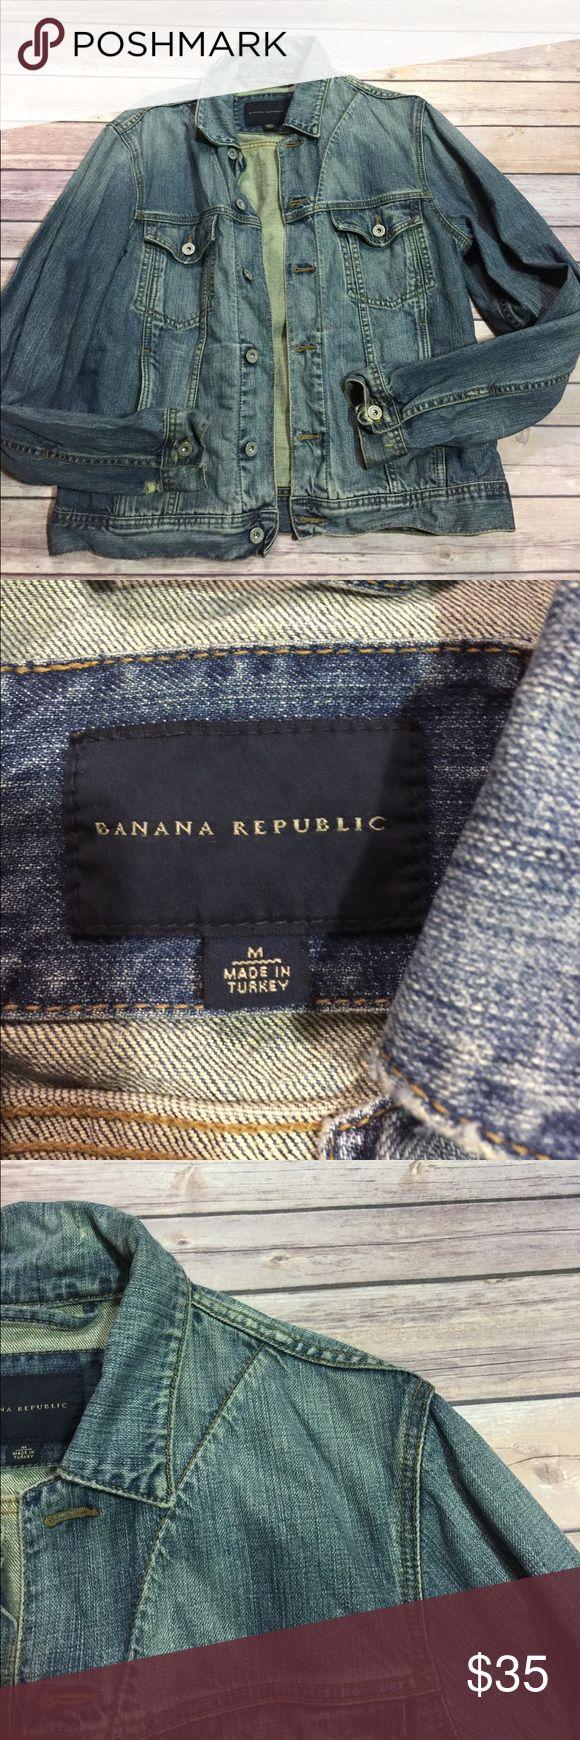 Banana Republic Jean Jacket Great condition ! Banana Republic Jackets & Coats Jean Jackets